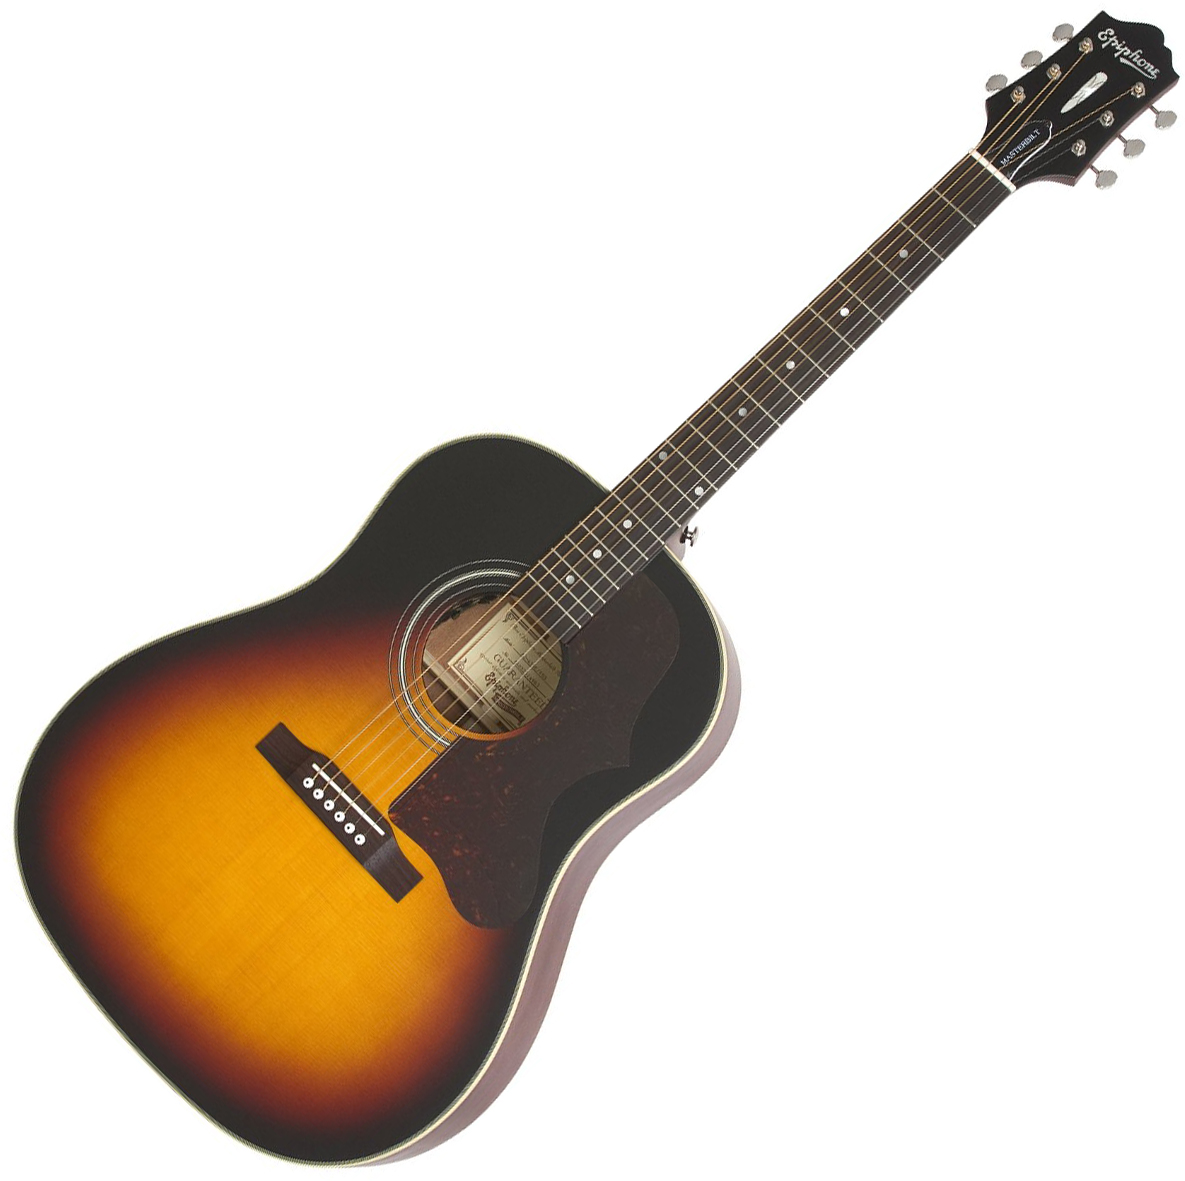 musicworks guitars acoustic electric guitars acoustic electric guitar epiphone guitar. Black Bedroom Furniture Sets. Home Design Ideas